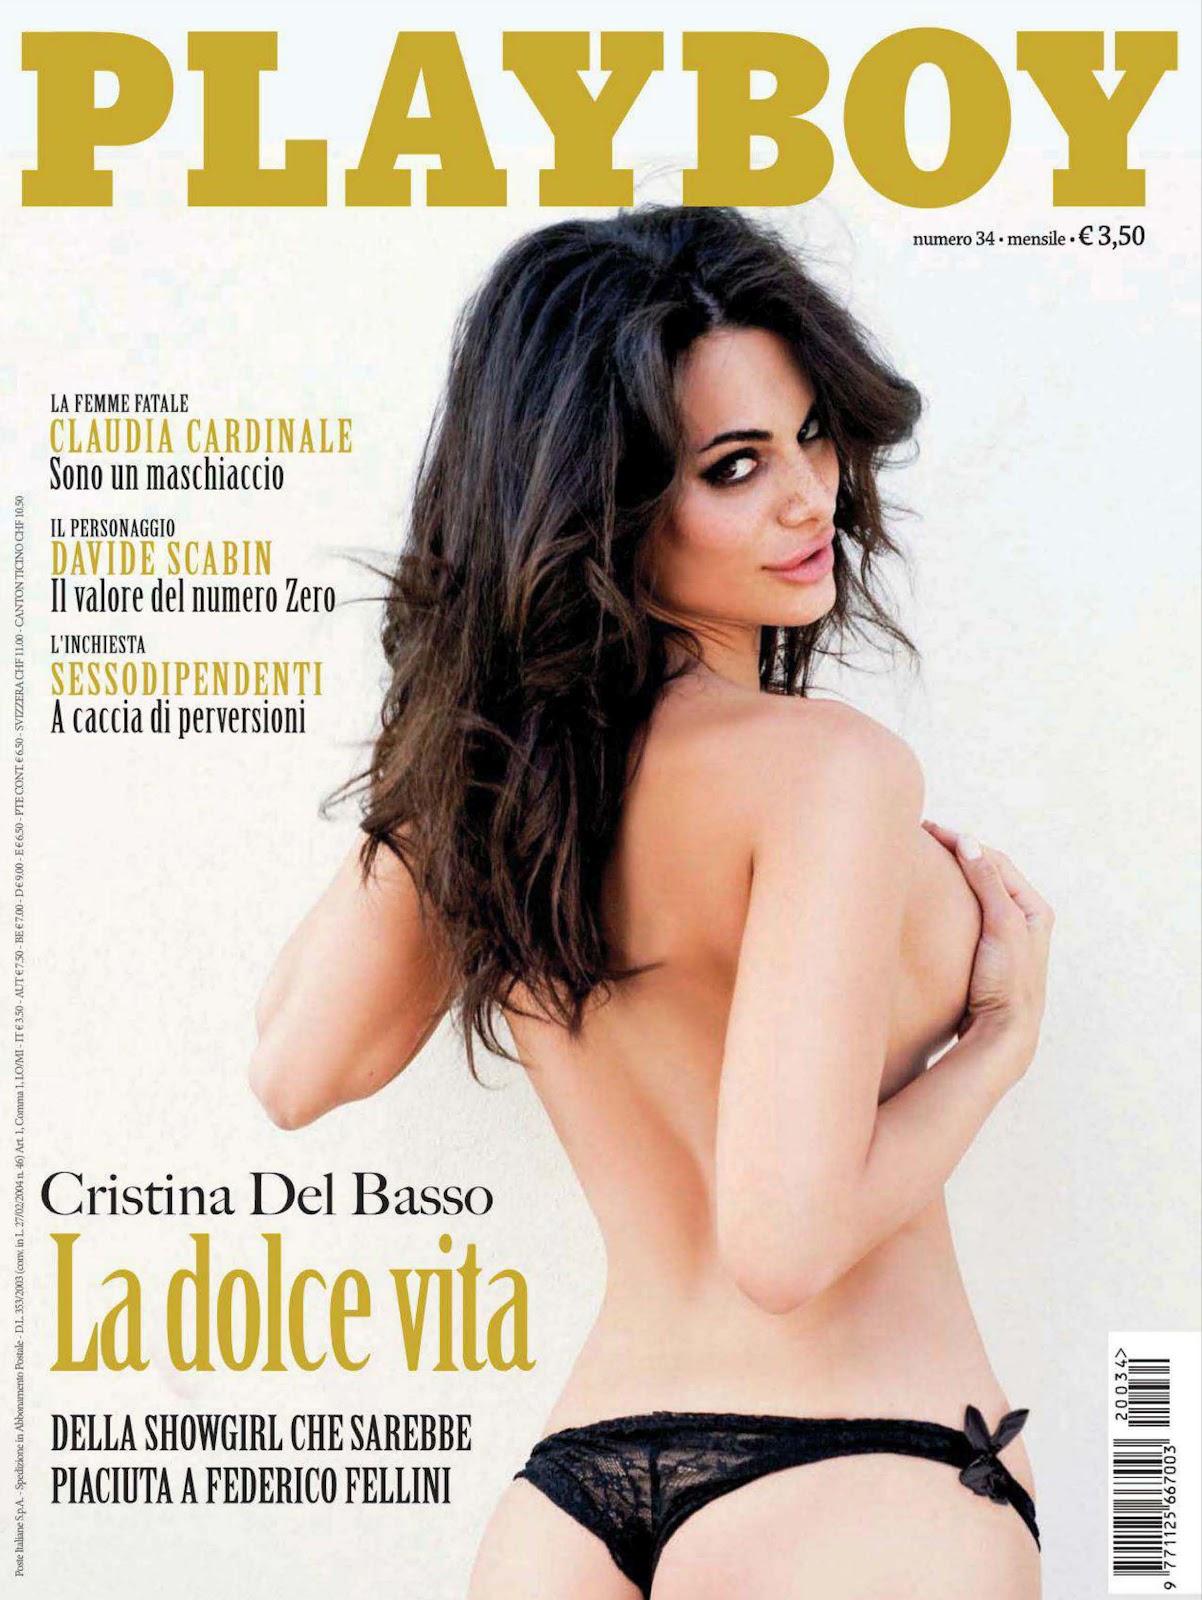 http://4.bp.blogspot.com/-8gGVjyGt4Dc/UBagRiBz7lI/AAAAAAAAA9g/vqt9gMnKfDc/s1600/Playboy+Italy+April+2012.jpeg